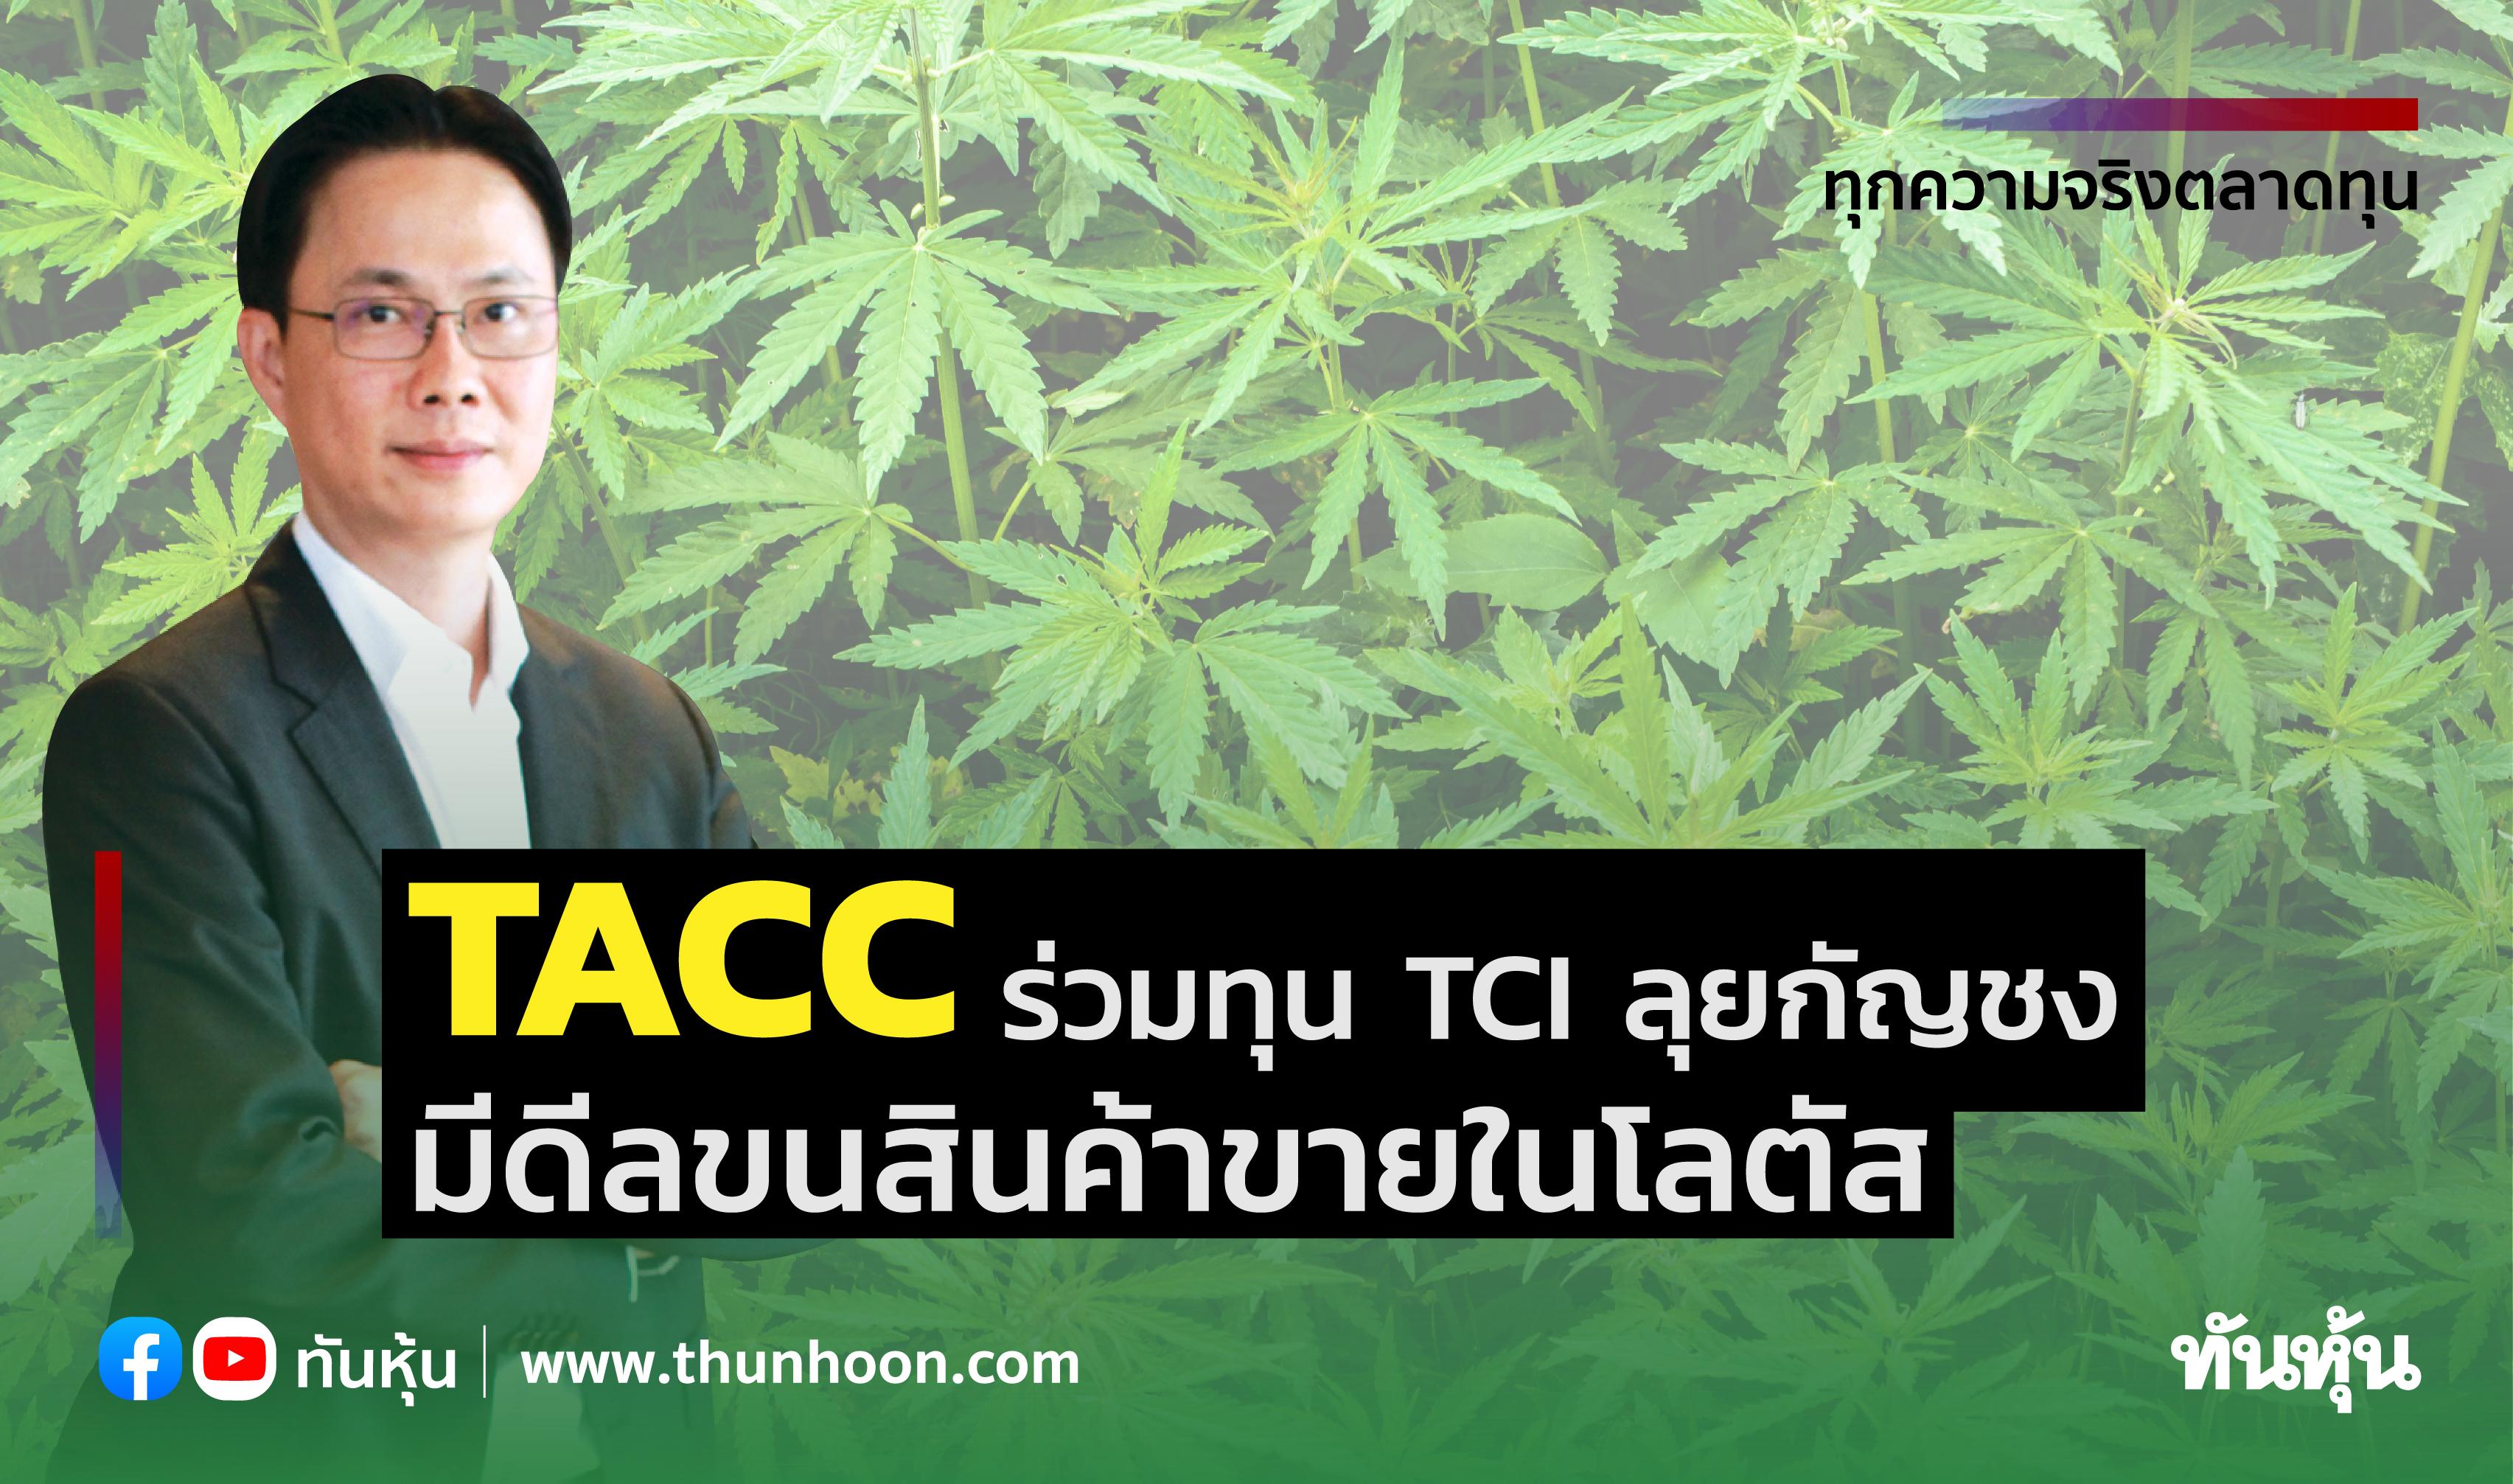 TACCร่วมทุนTCIลุยกัญชง มีดีลขนสินค้าขายในโลตัส